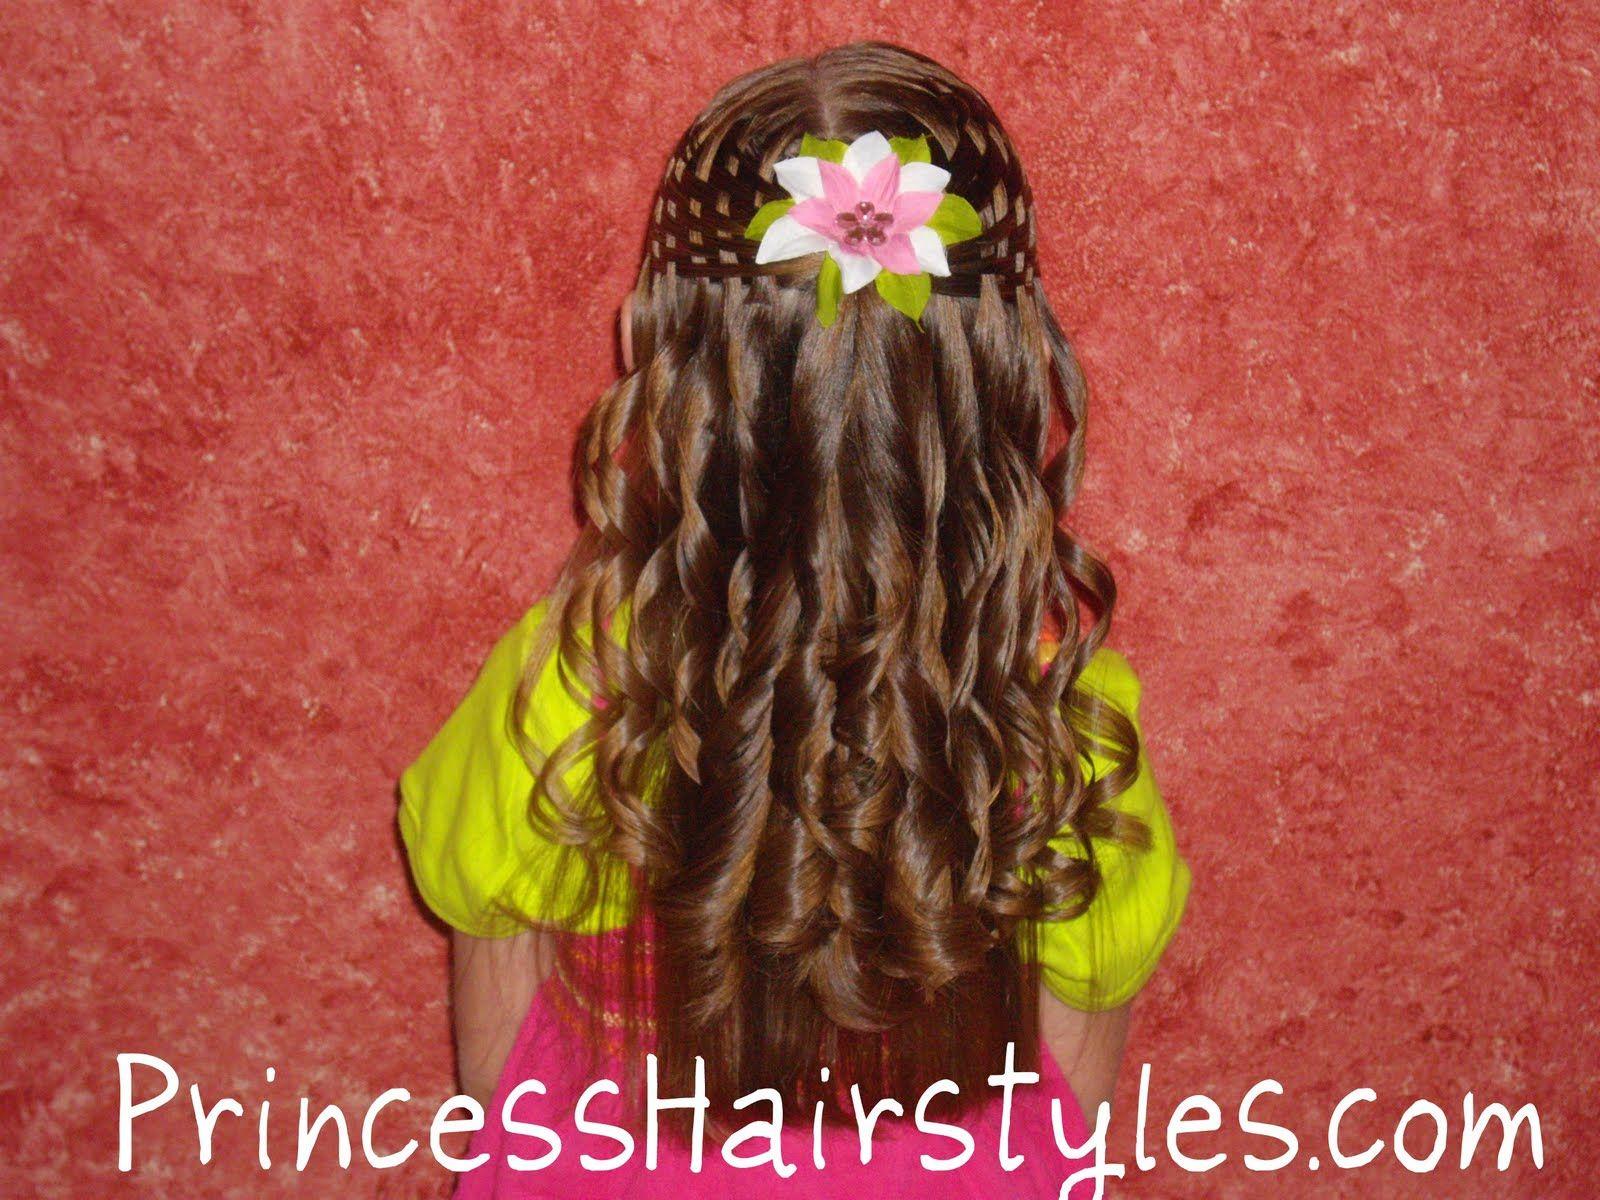 Enjoyable 1000 Images About Female Hairstyles On Pinterest Princess Short Hairstyles Gunalazisus